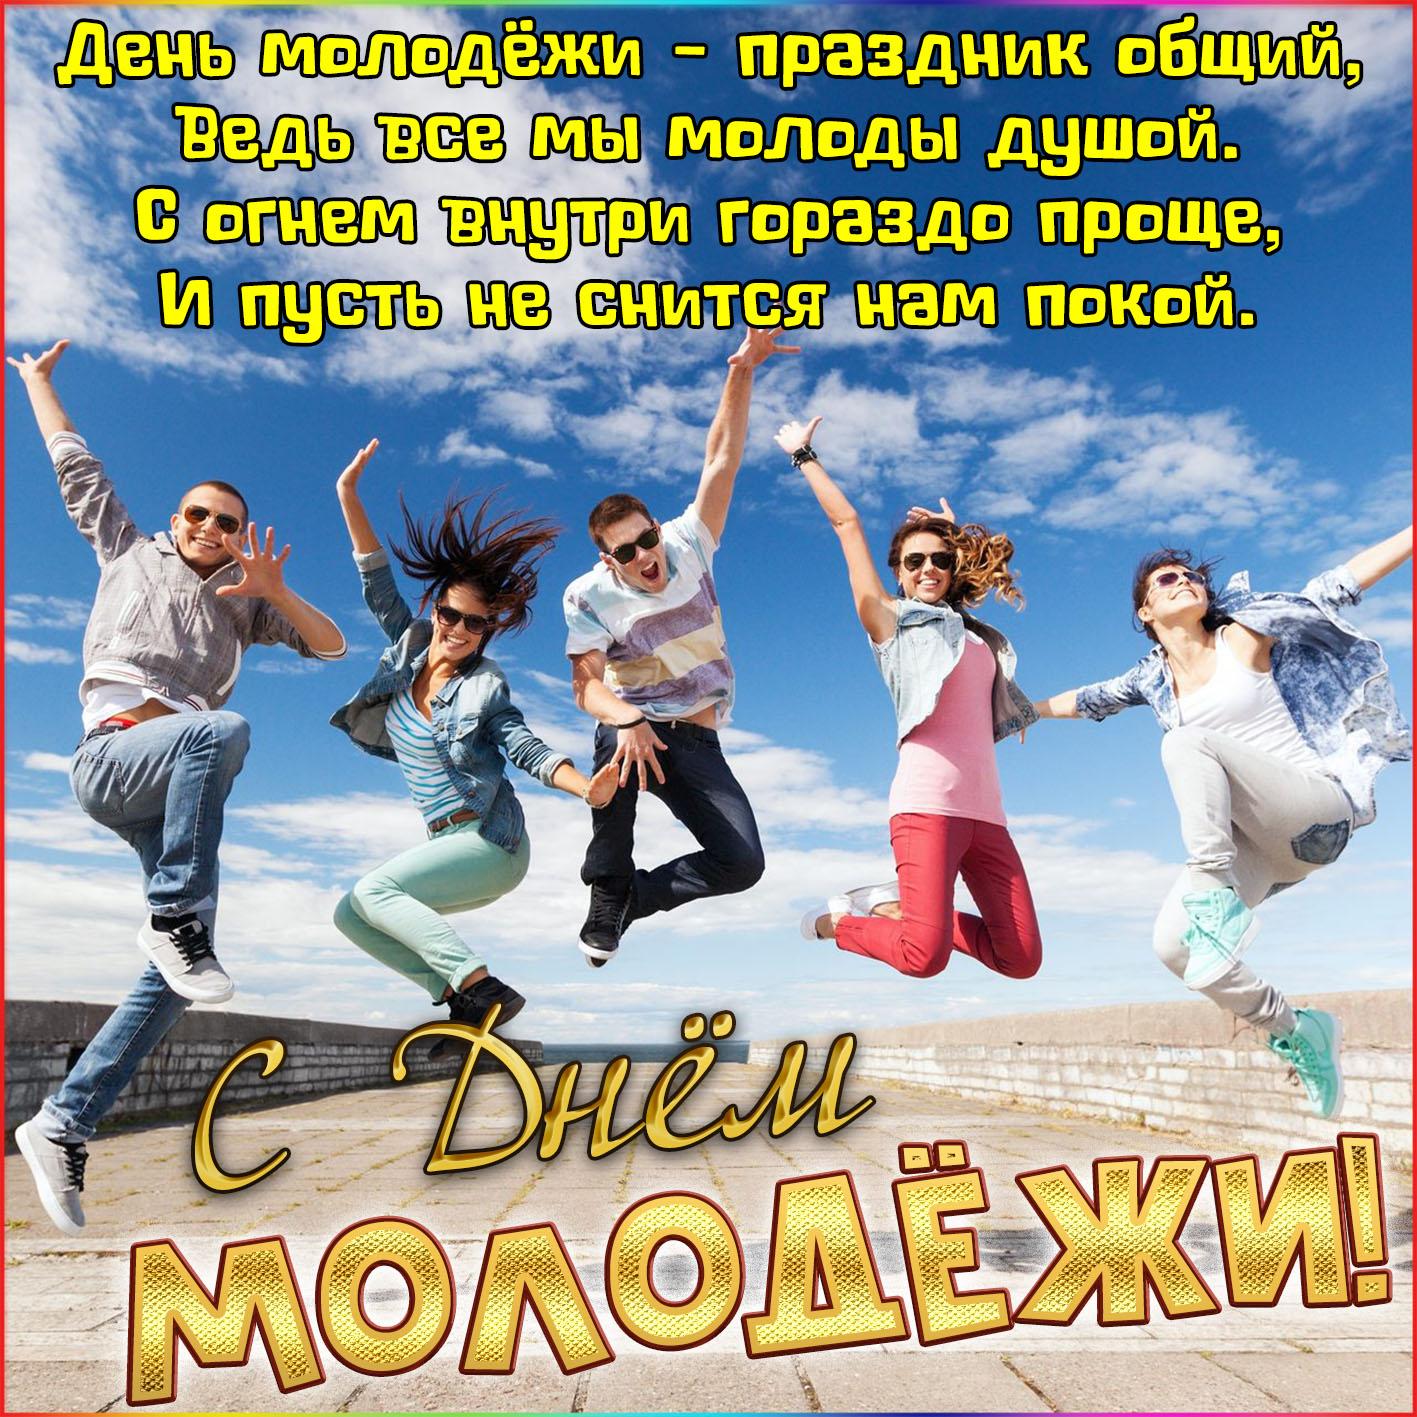 фото день молодежи россии роршаха